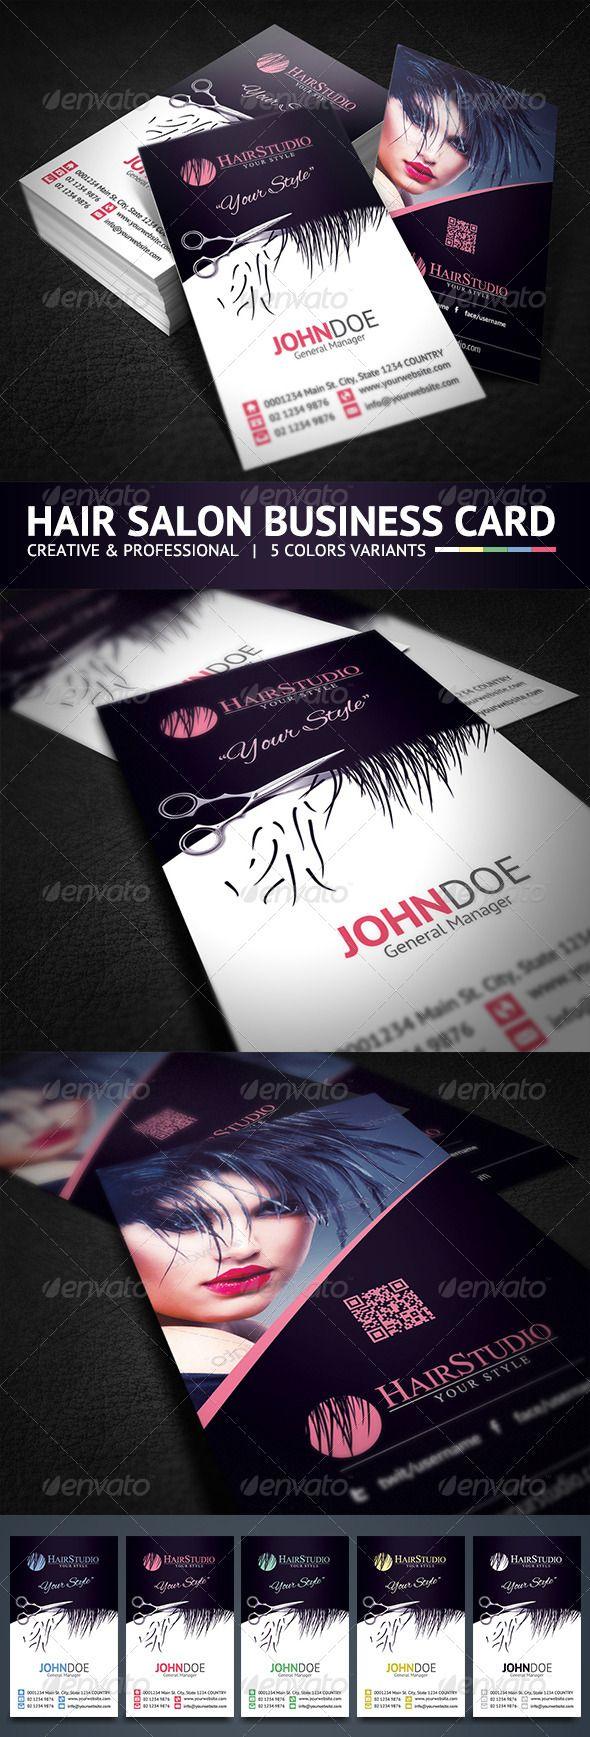 Creative Hair Salon Business Card   Pinterest   Business cards ...